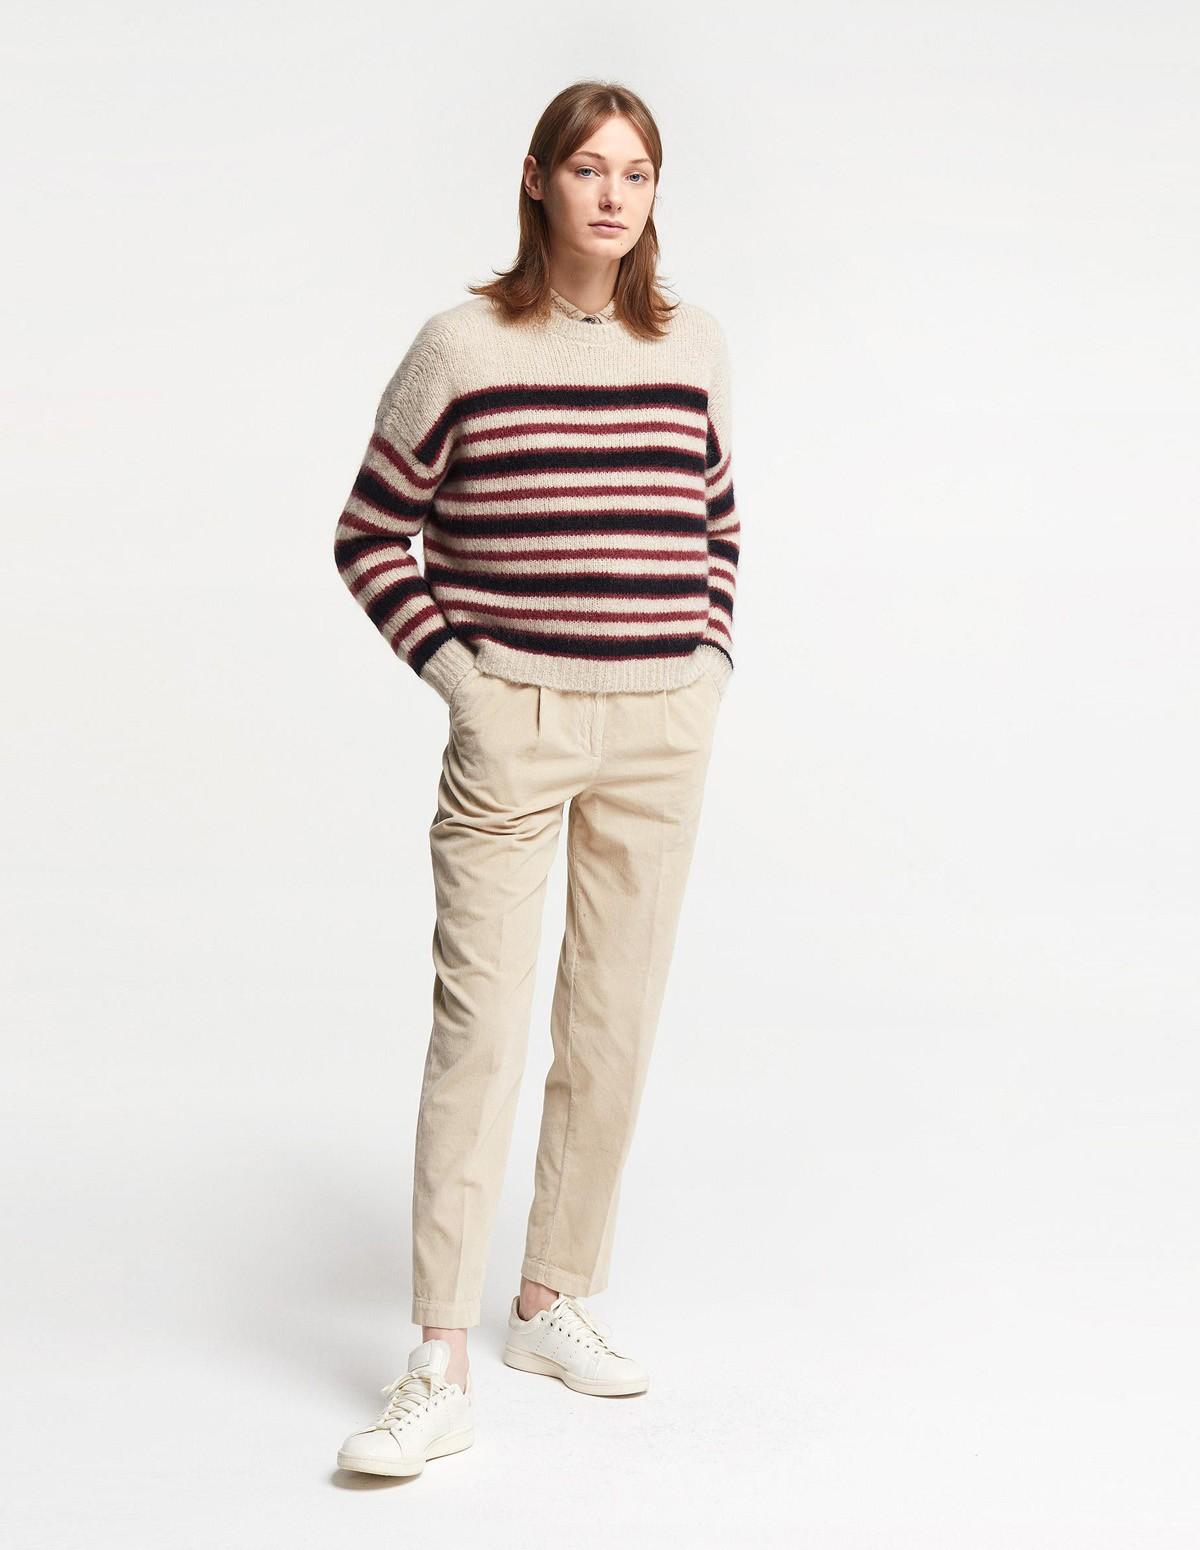 Pom 7163/10563 Pants - CHAMPAGNE